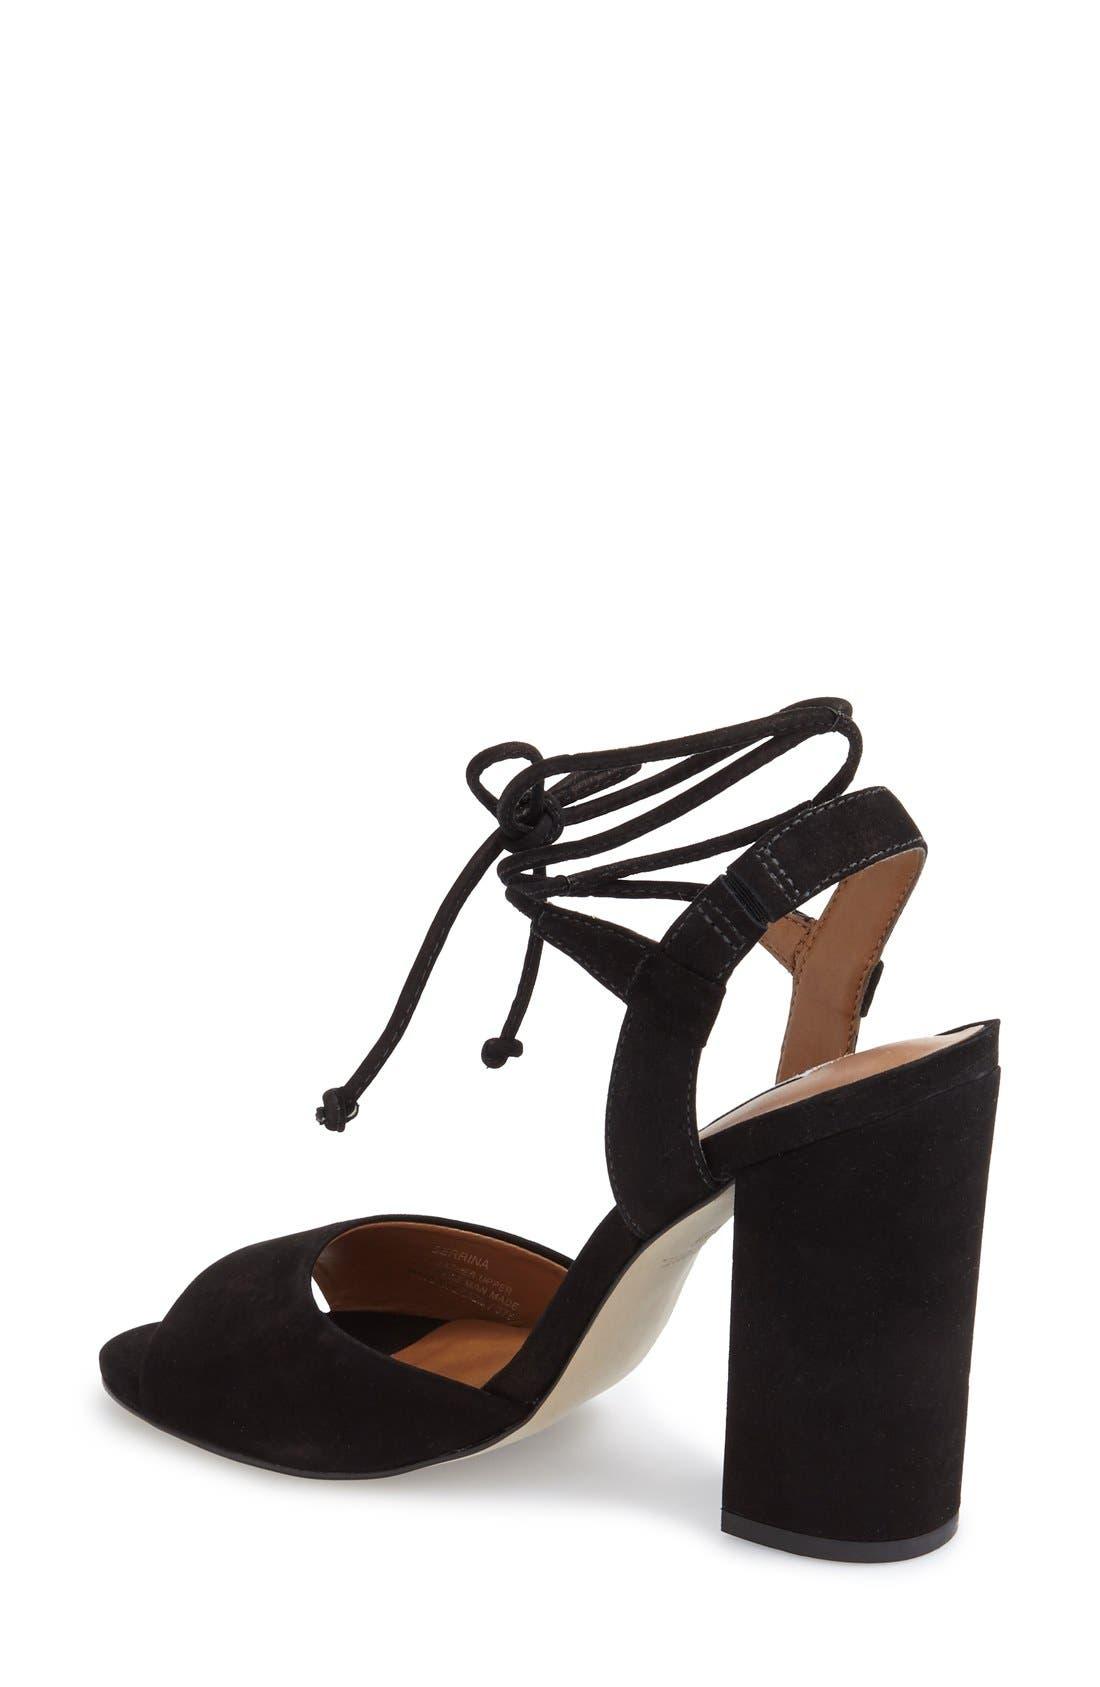 Alternate Image 2  - Steve Madden 'Serrina' Block Heel Lace Up Sandal (Women)